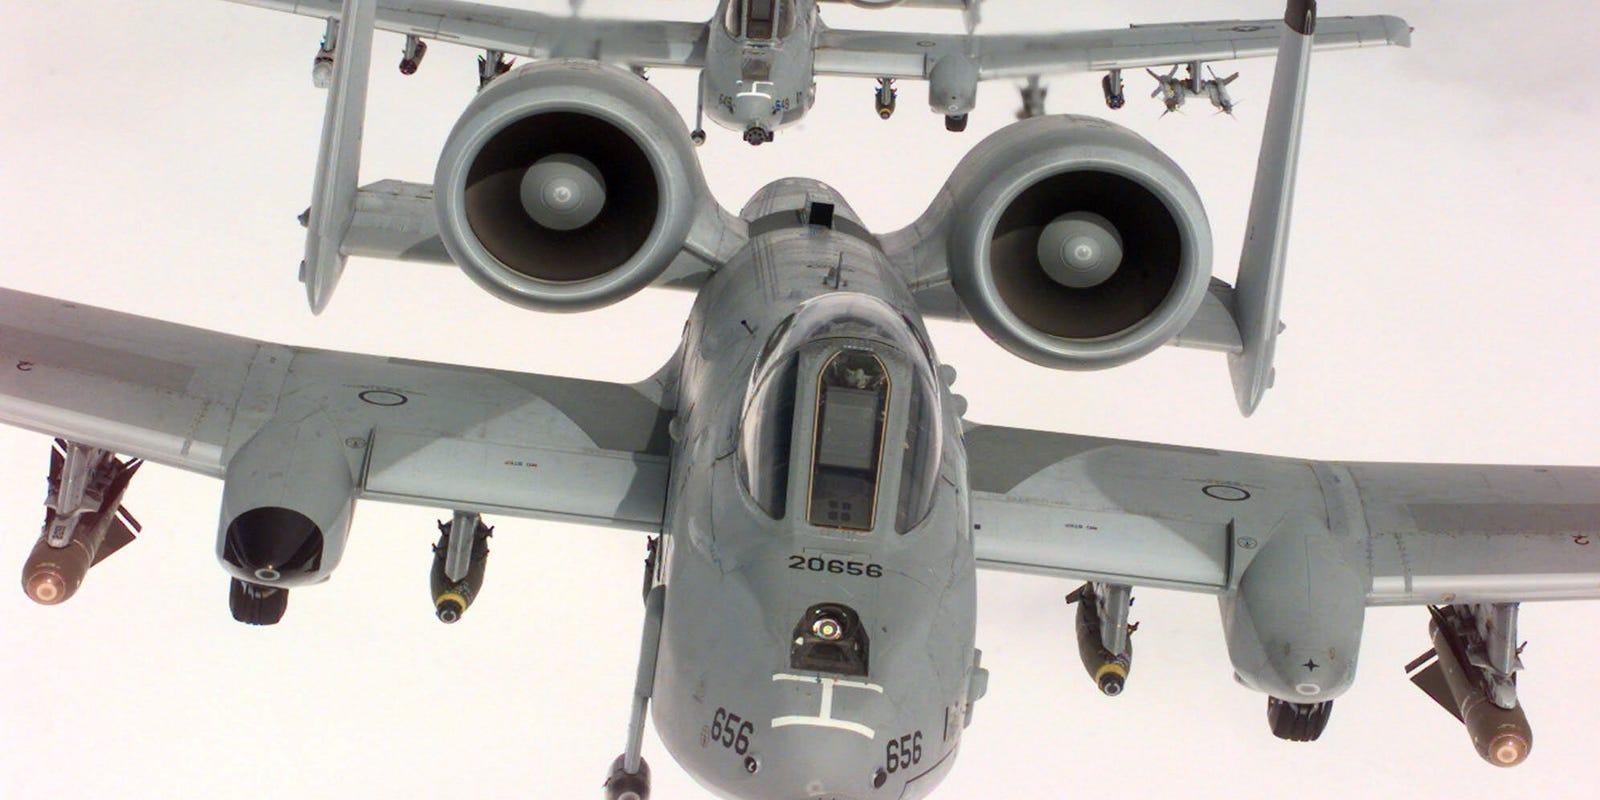 Arizona's congressional Democrats rally to save the A-10 'Warthog'